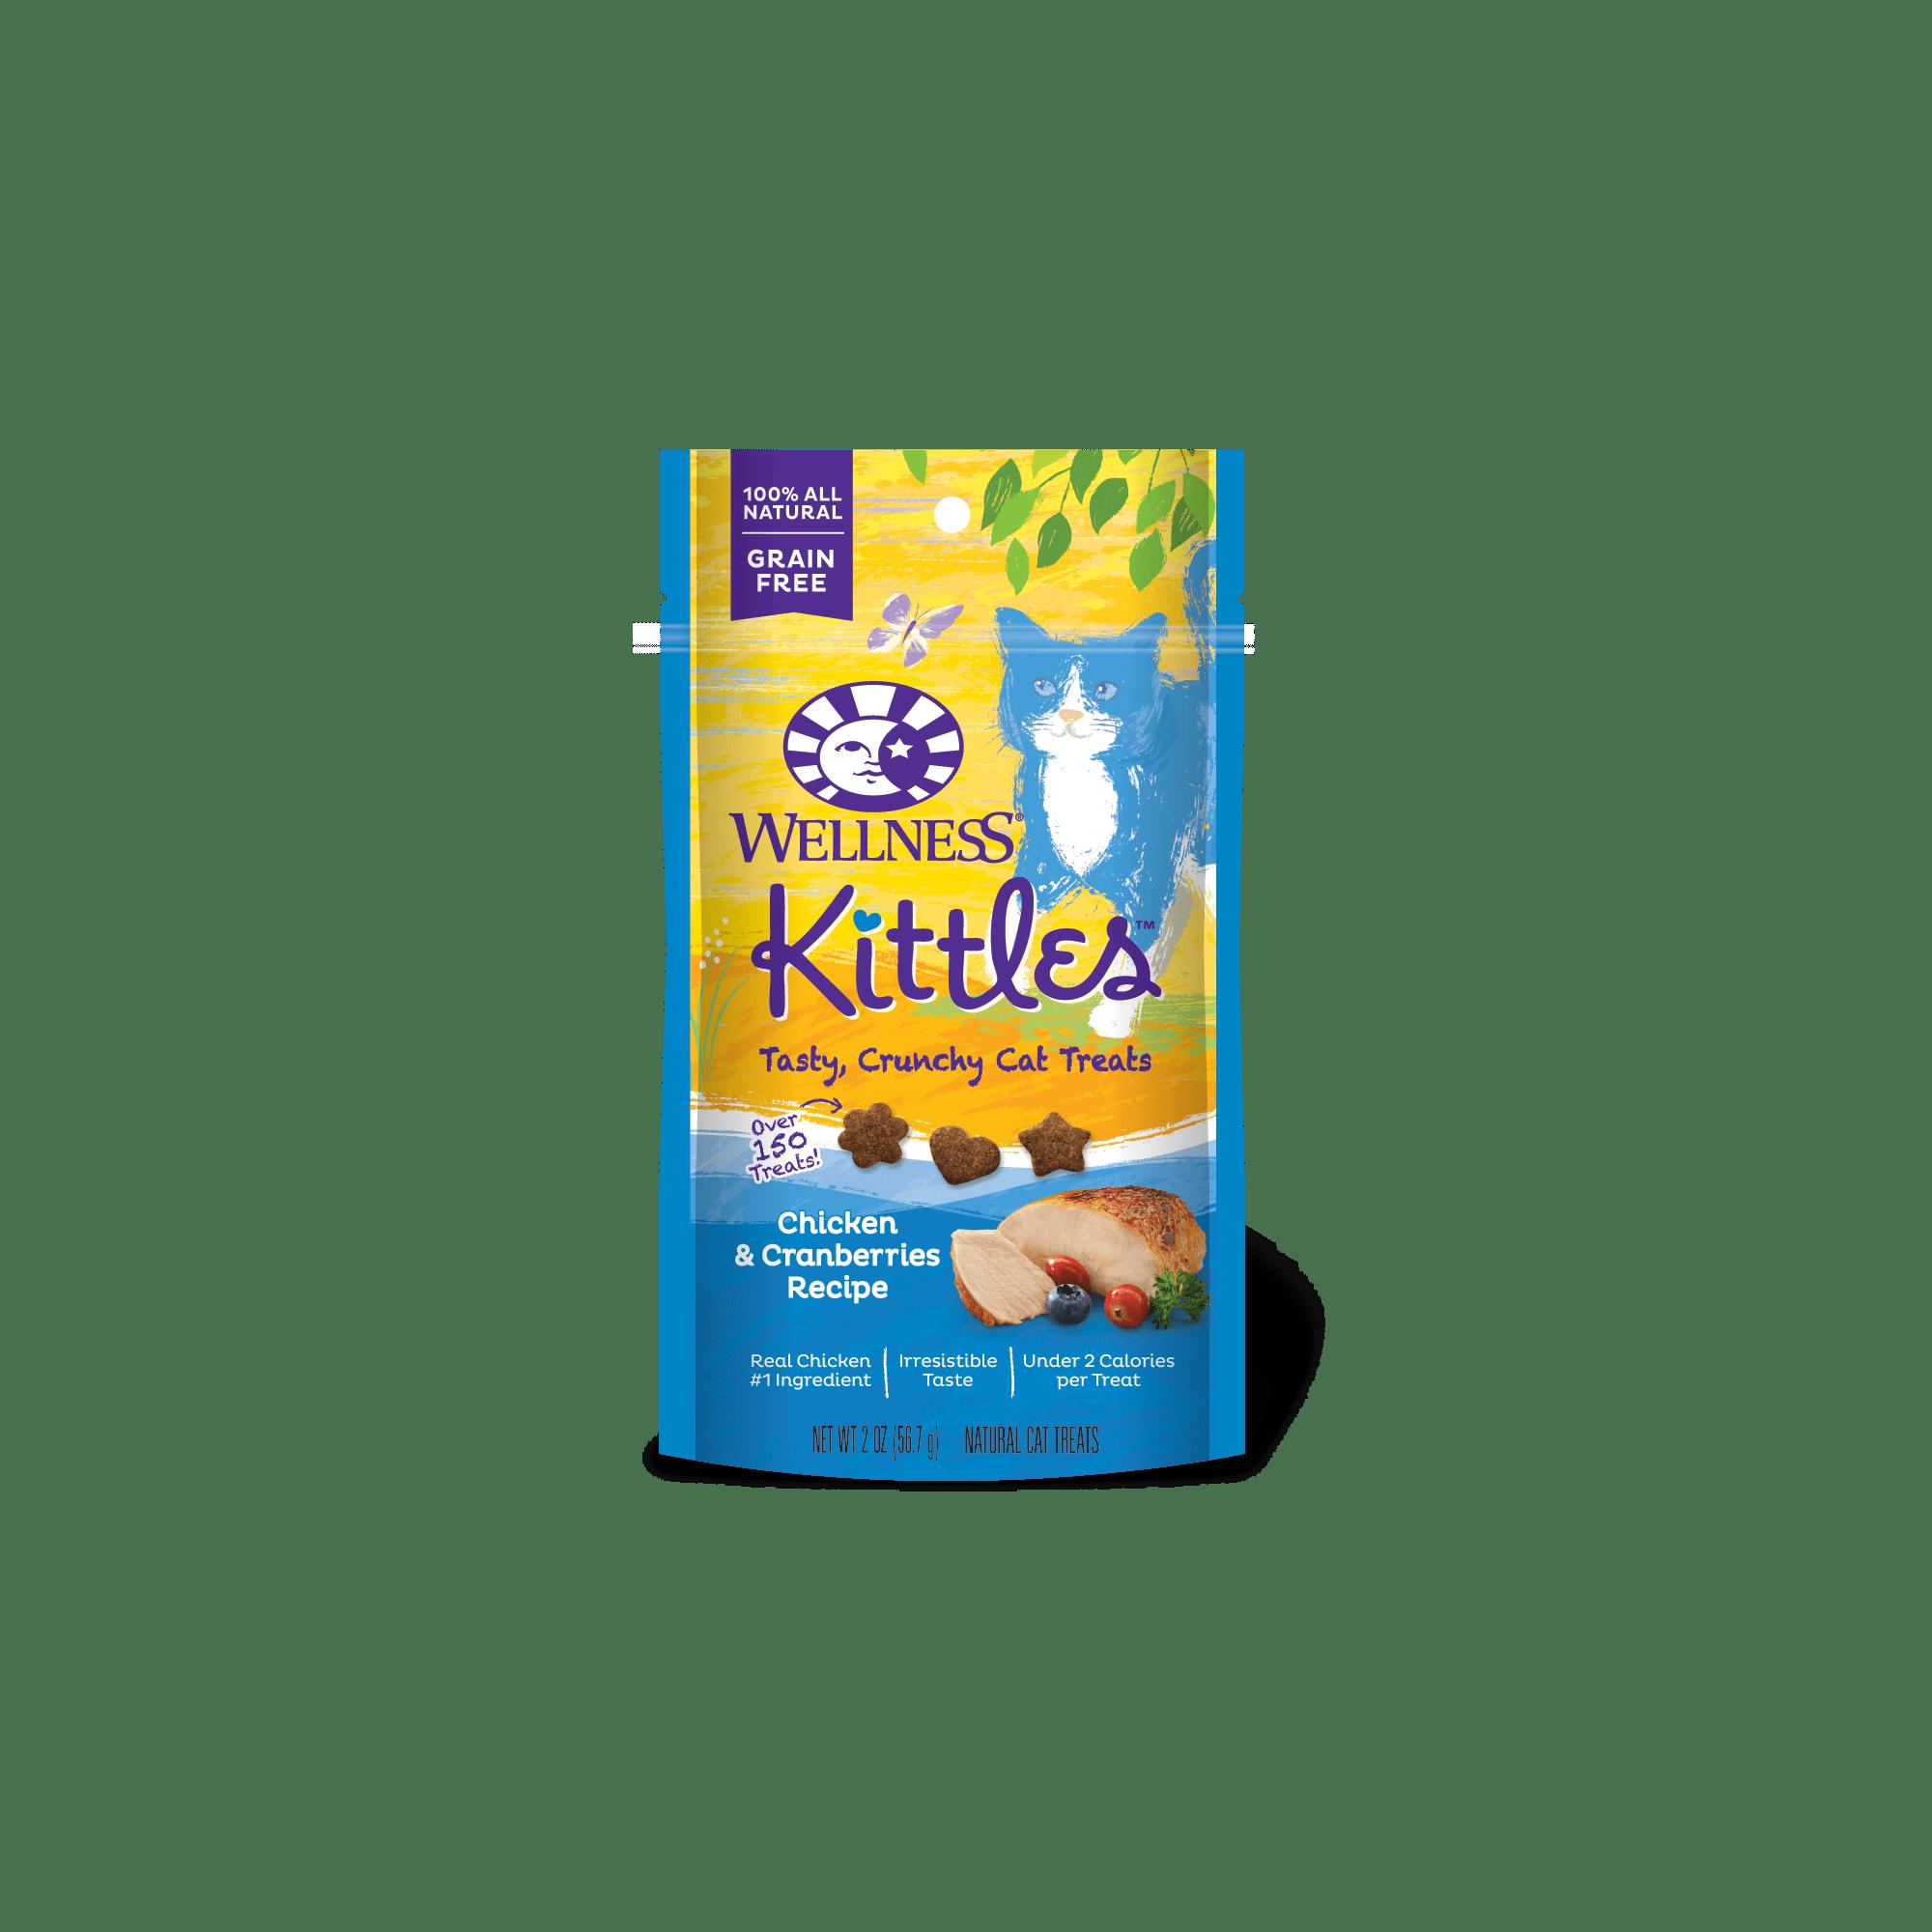 Kittles Chicken Amp Cranberries Recipe